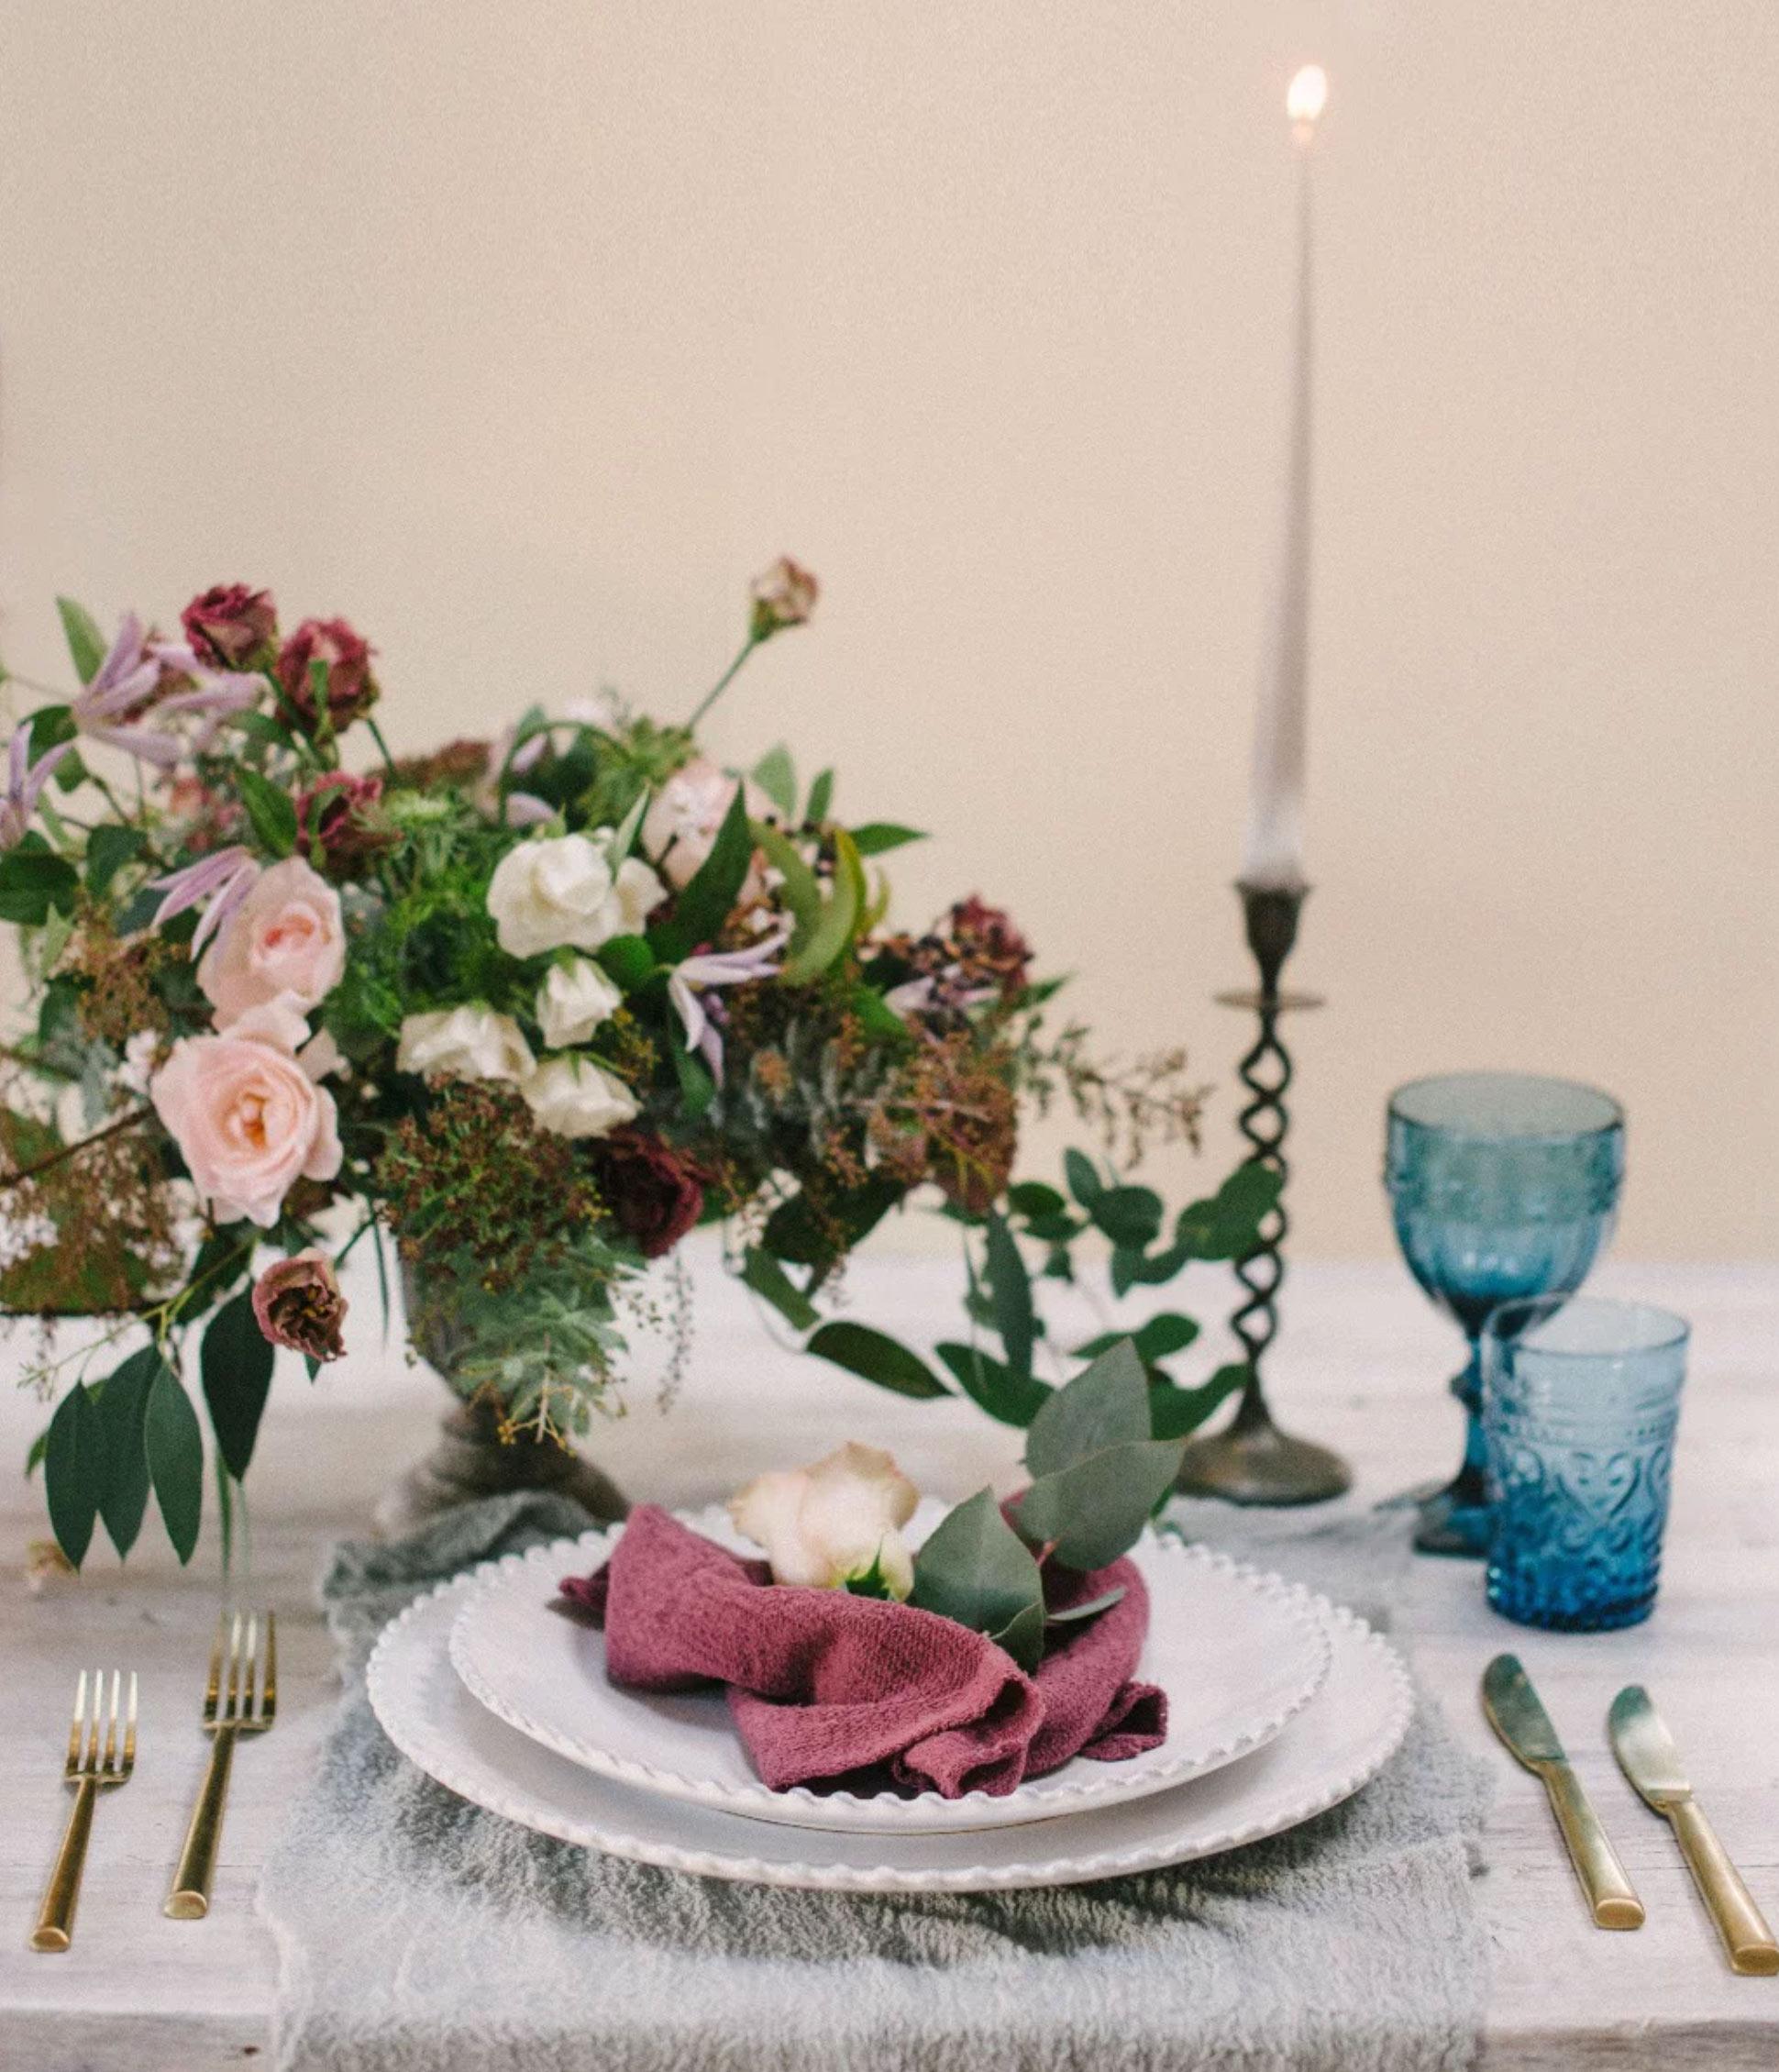 Modern luxury wedding planning and styling inspiration - Mirabella Weddings